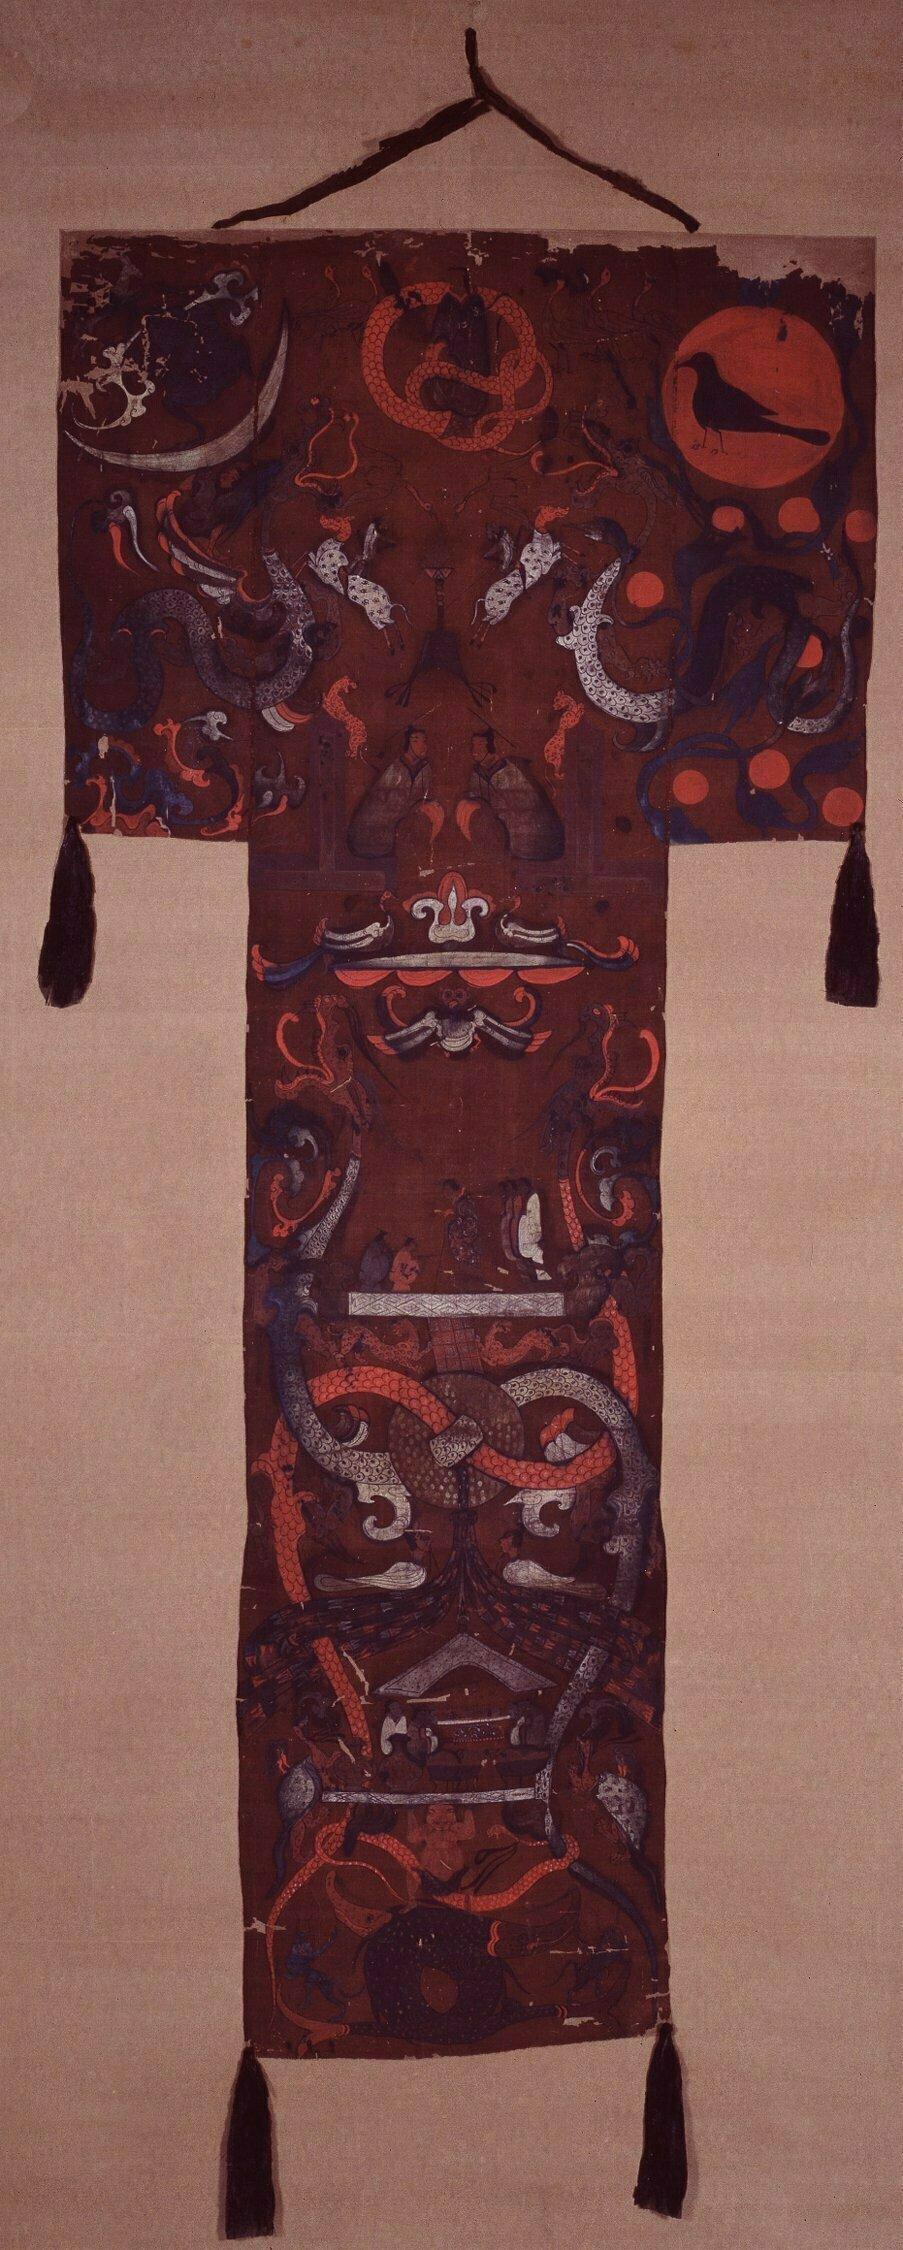 Mawangdui_silk_banner_from_tomb_no1